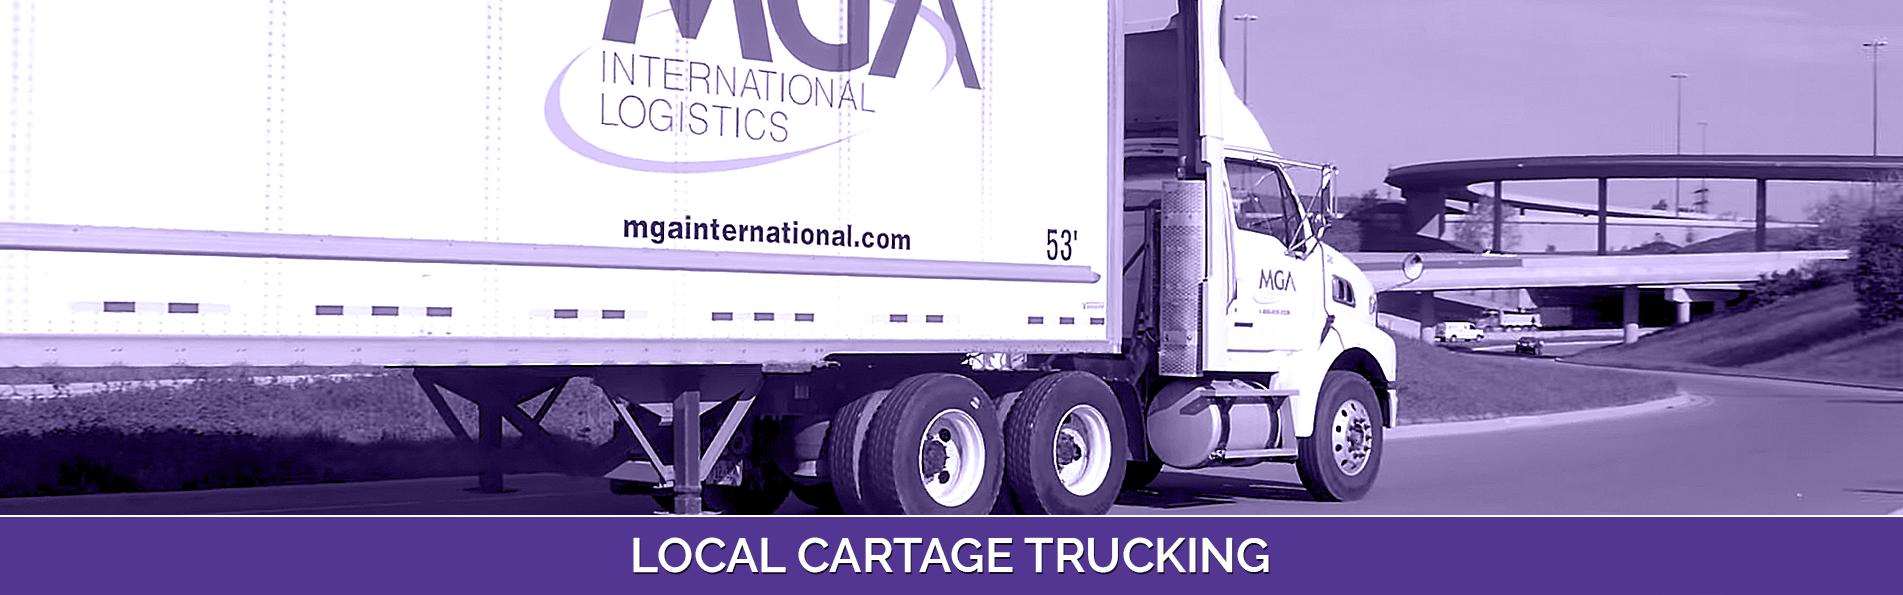 Local Cartage Trucking